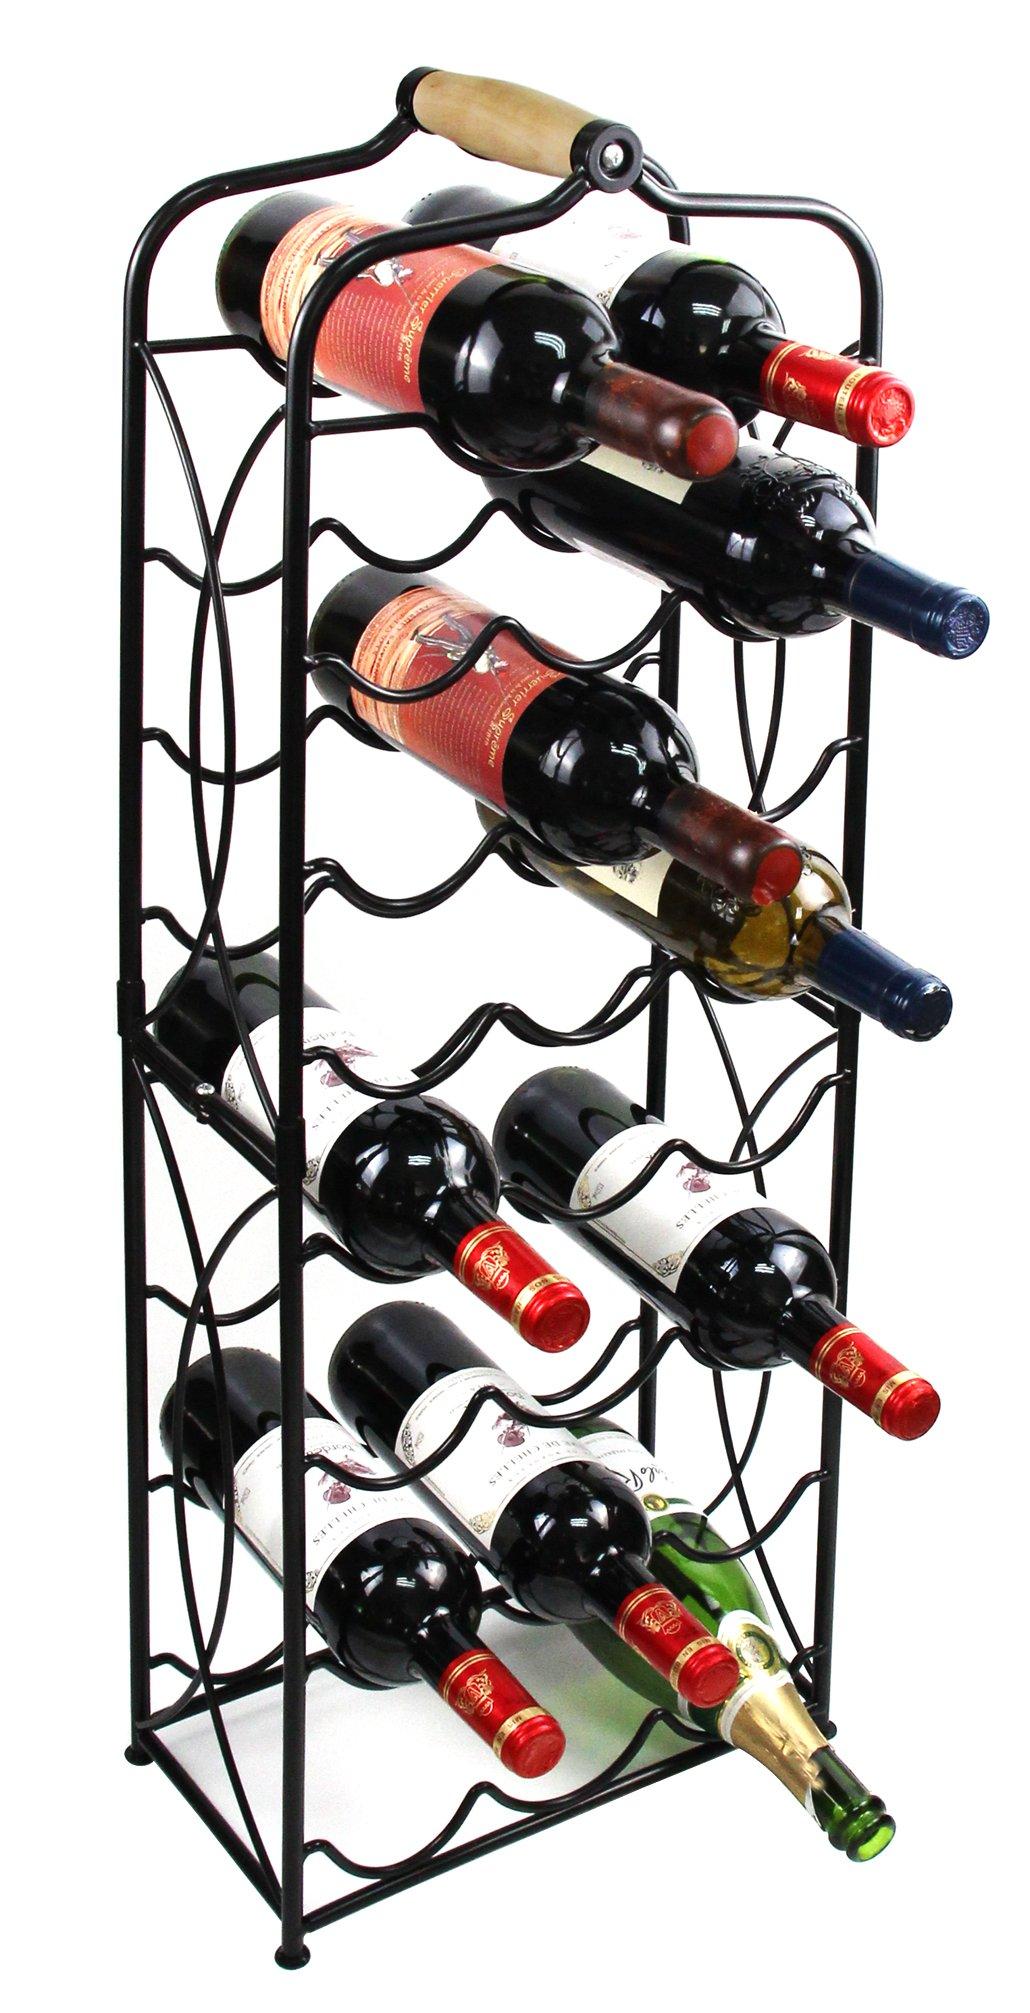 PAG 23 Bottles Metal Wine Racks Stand Display Holder with Wood Handle, Black by PAG